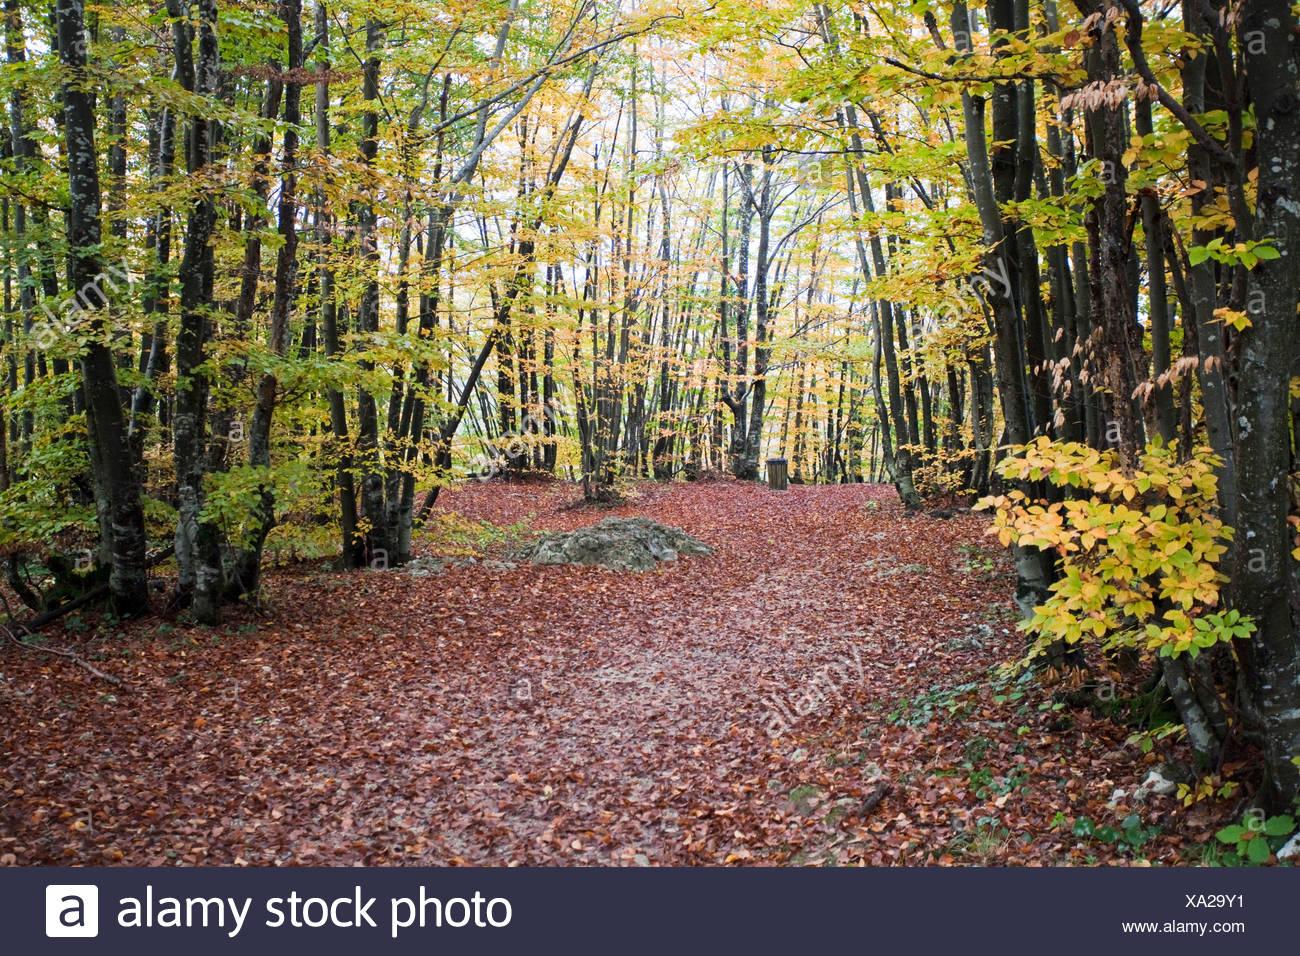 Croatia, Europe, Plitvicer lakes, Jezera, lake, sea, national park, trees, autumn, foliage, wood, forest, Stock Photo